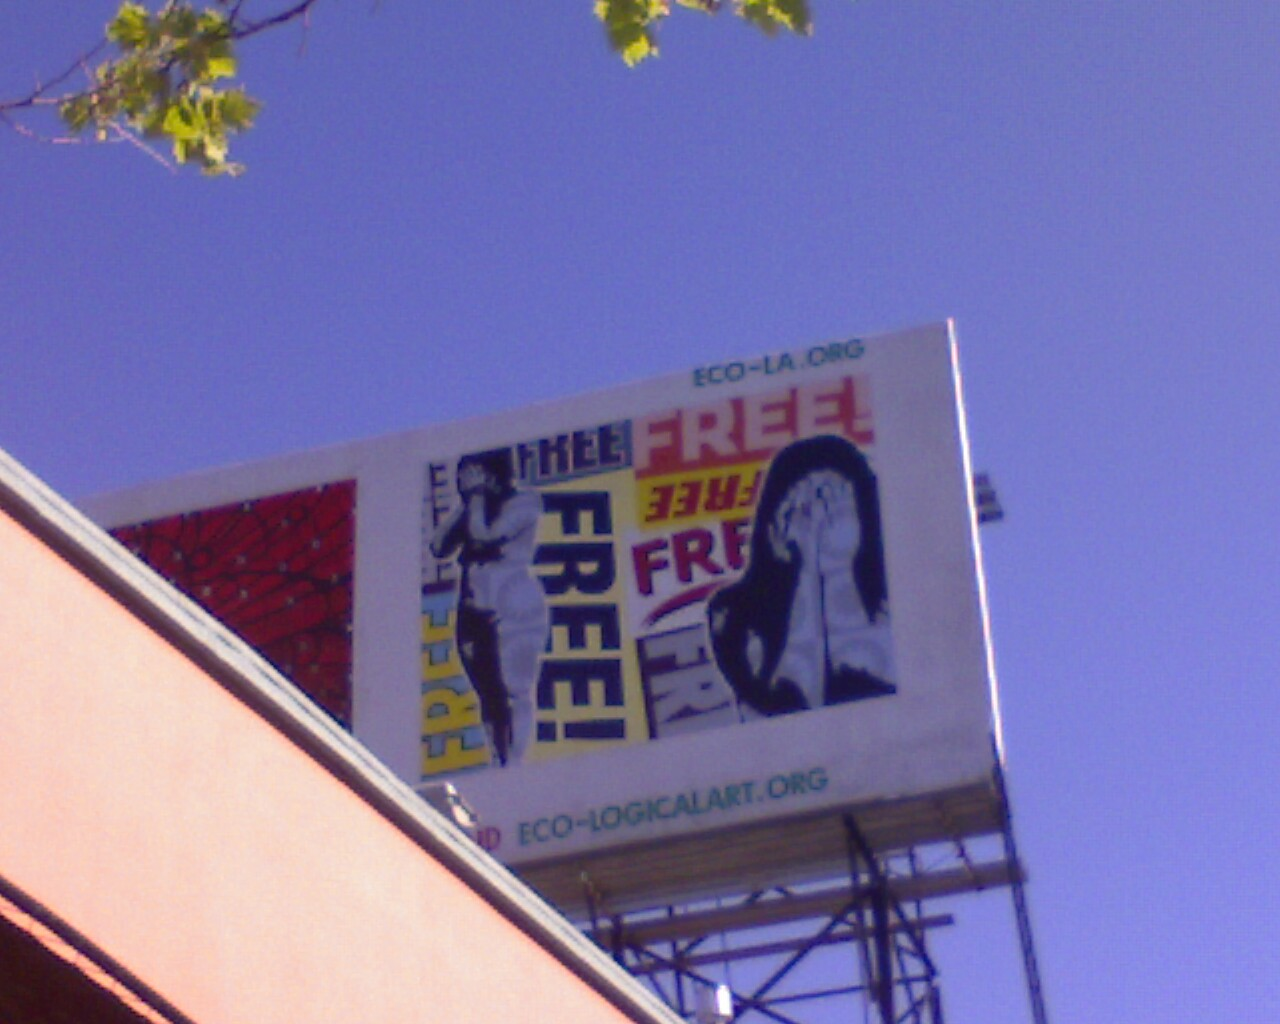 [bm-image-734131.jpe]